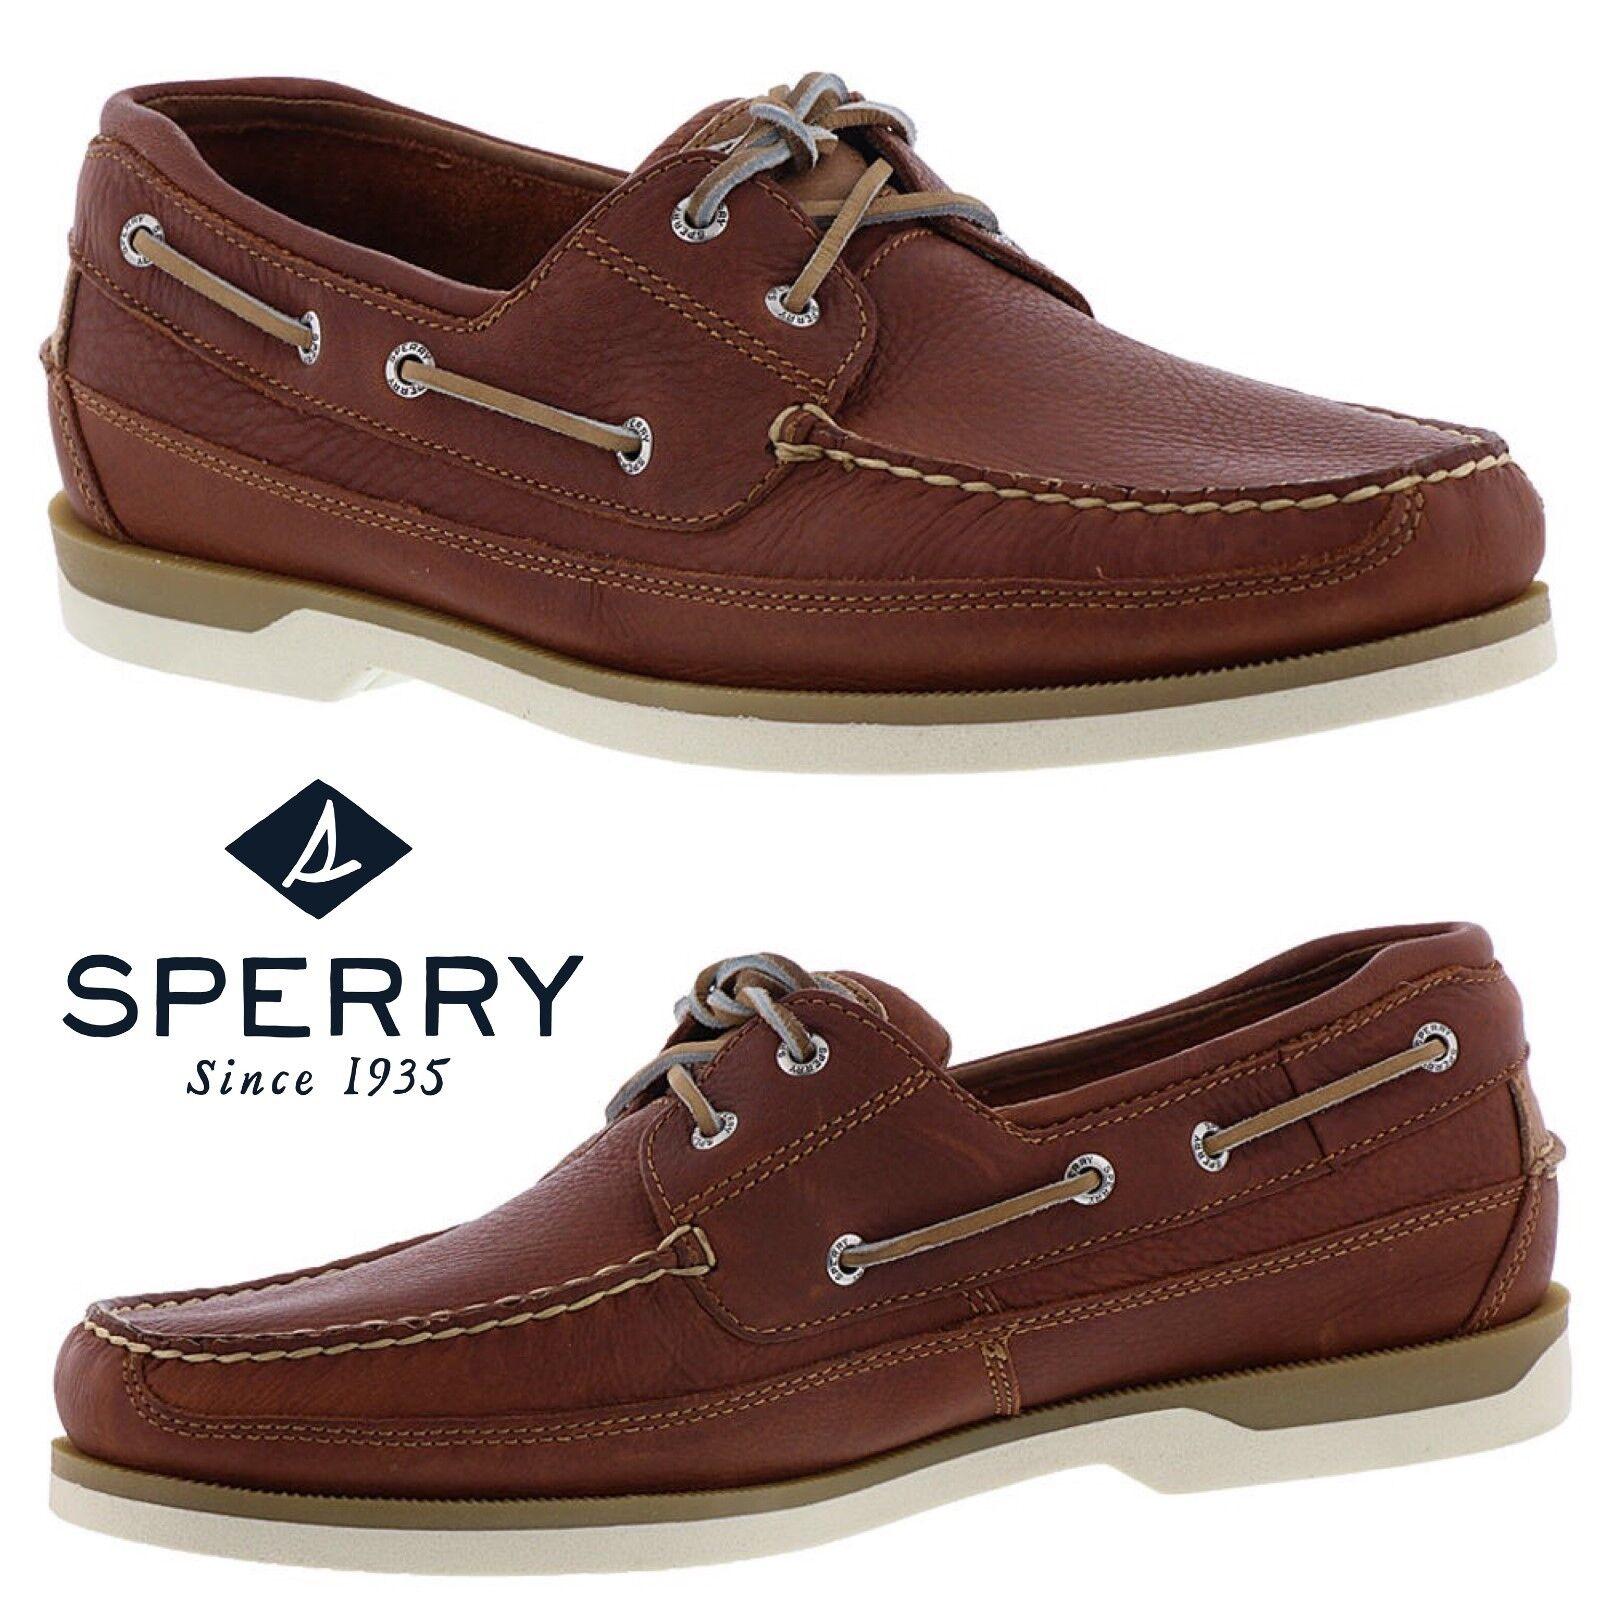 Scarpe casual da uomo  Sperry Top-Sider Mako 2-Eye Canoe Moc Shoes Work Comfort Leather Walking NWB